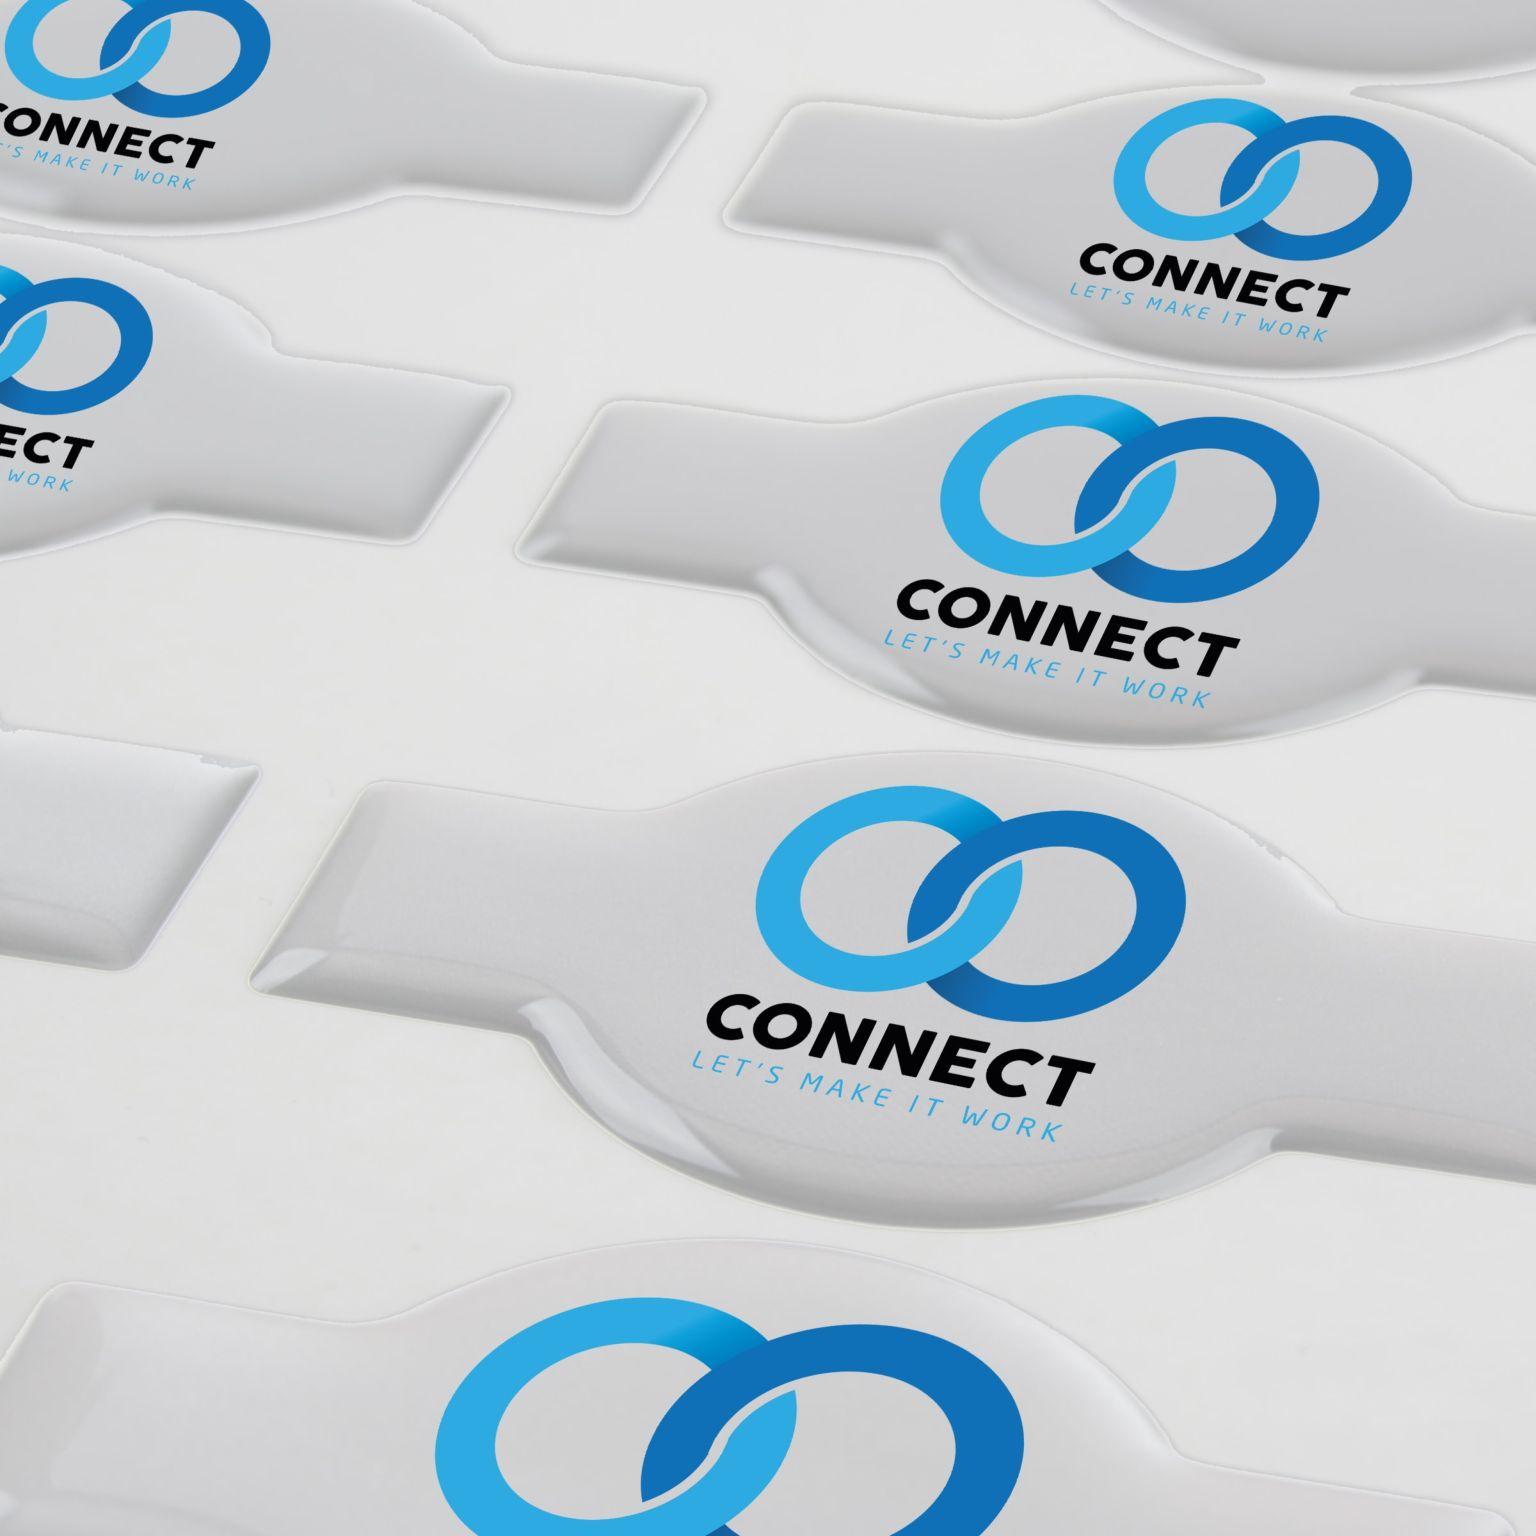 Doming Sticker Flexible Contour Matt, Flexible Contour, Extra adhesive, < 5 cm2 avec doming quadri   PHOSPHORESCENCE 267, rue François Perrin par PHOSPHORESCENCE